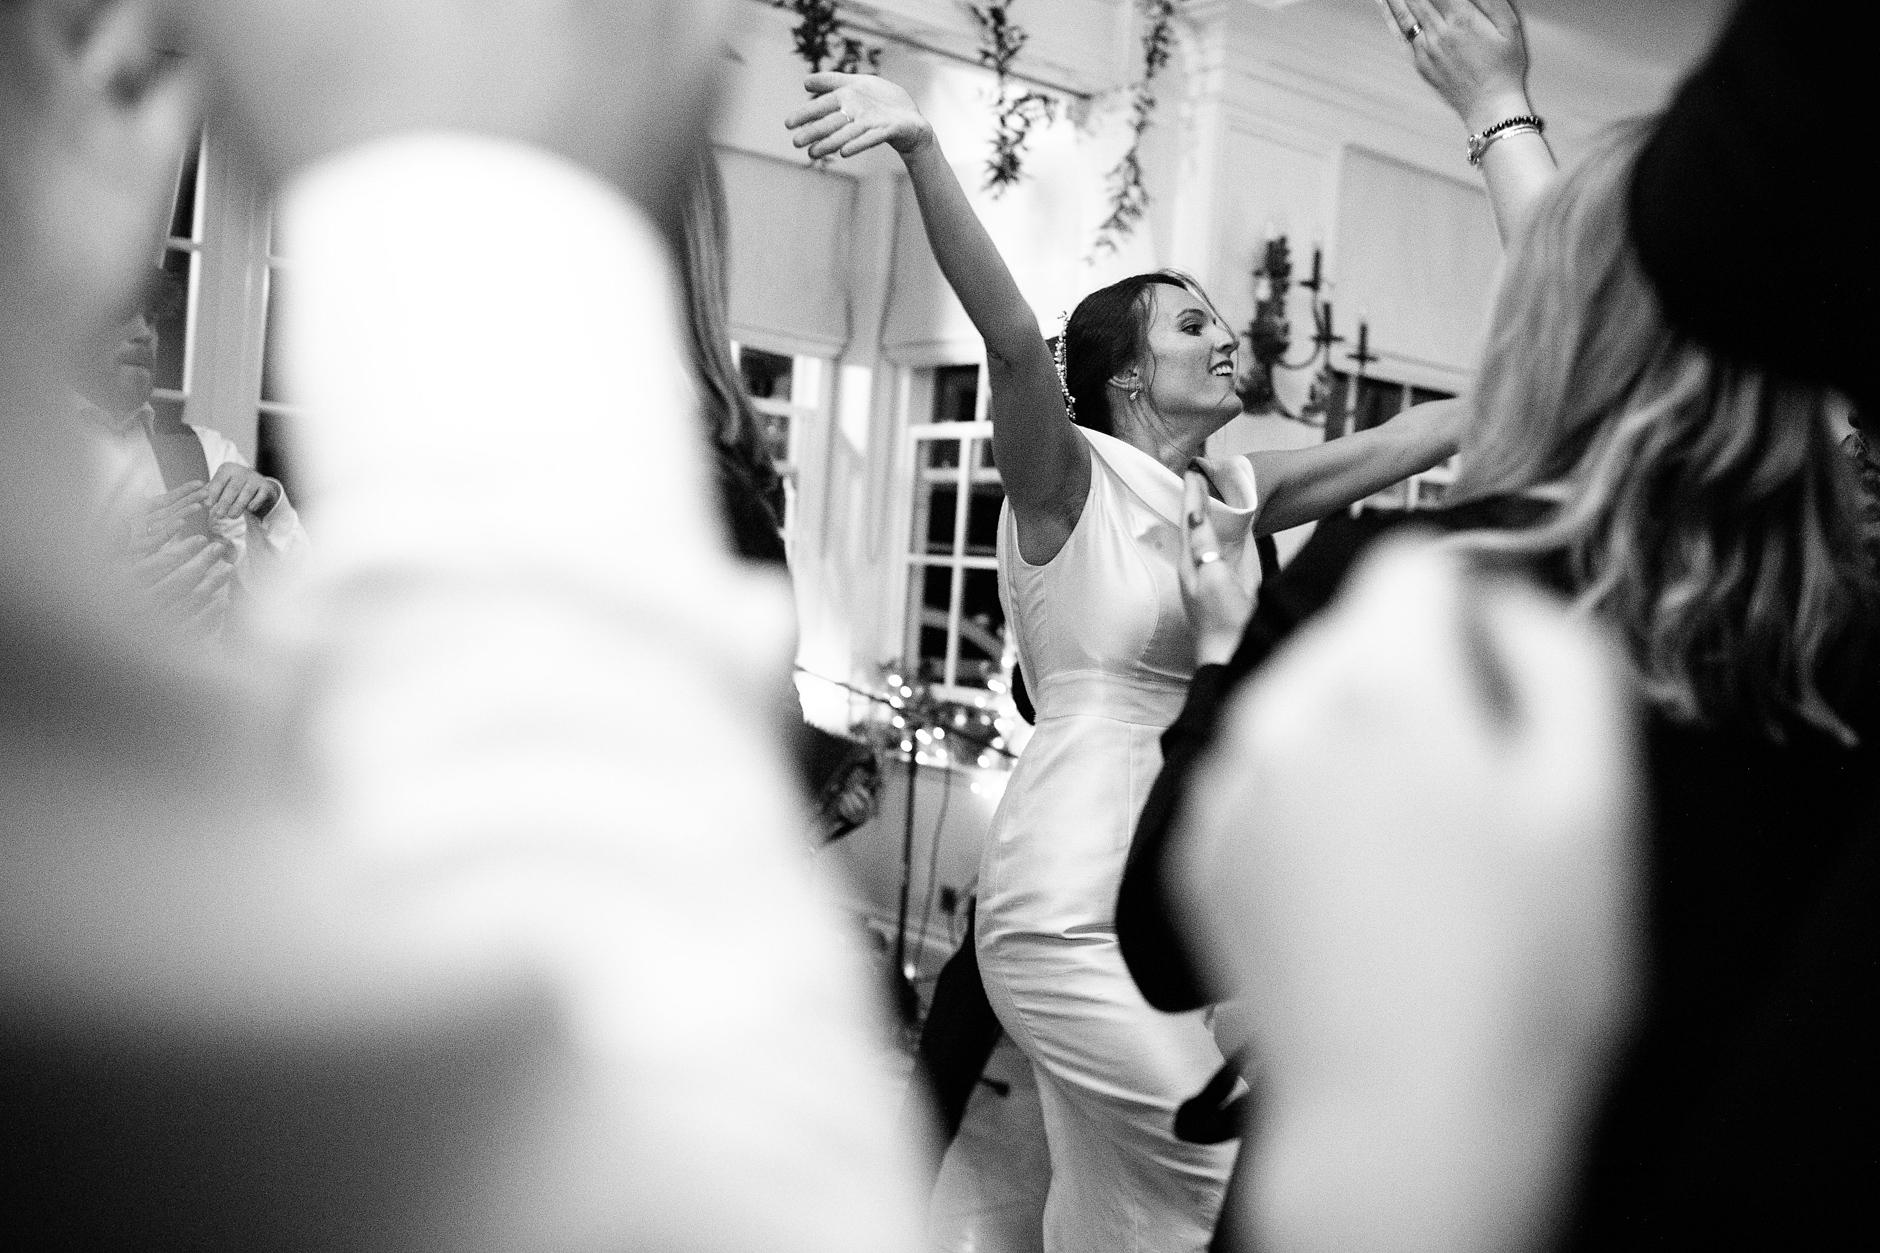 Glentruim-Wedding-Nikki-Leadbetter-Photography-395.jpg